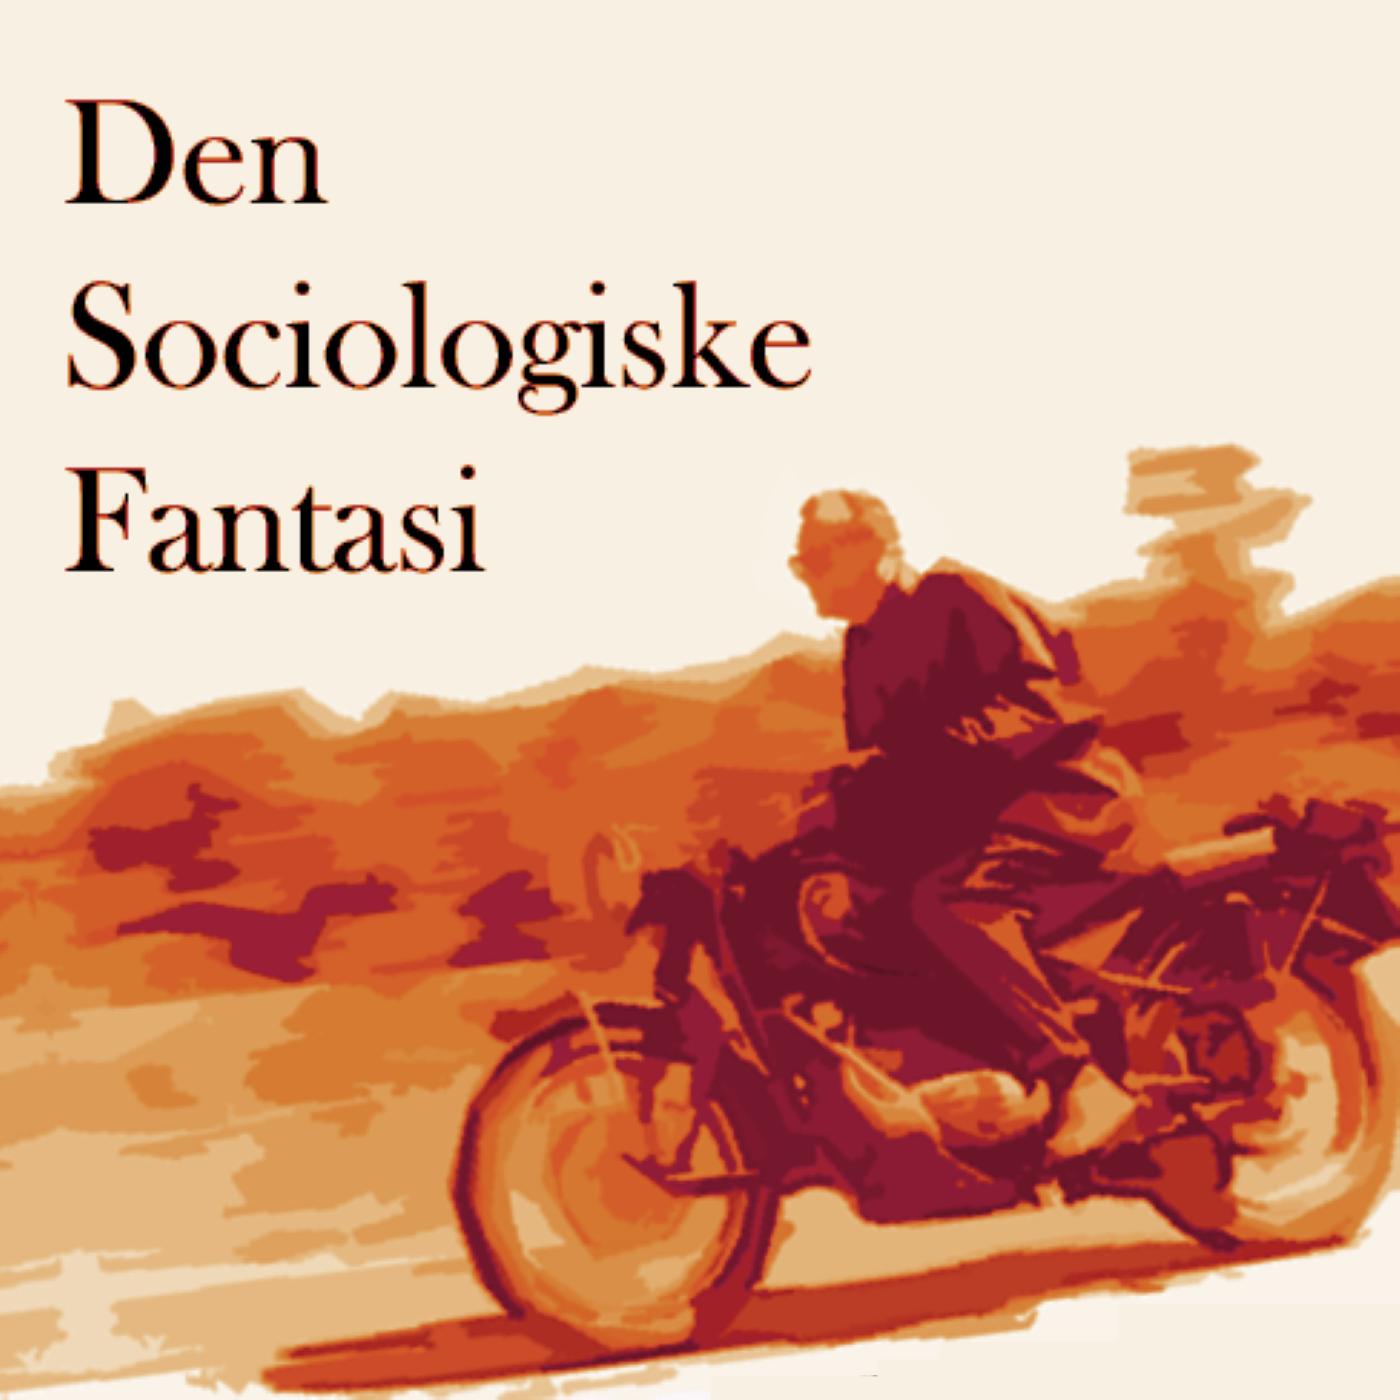 Den Sociologiske Fantasi show art